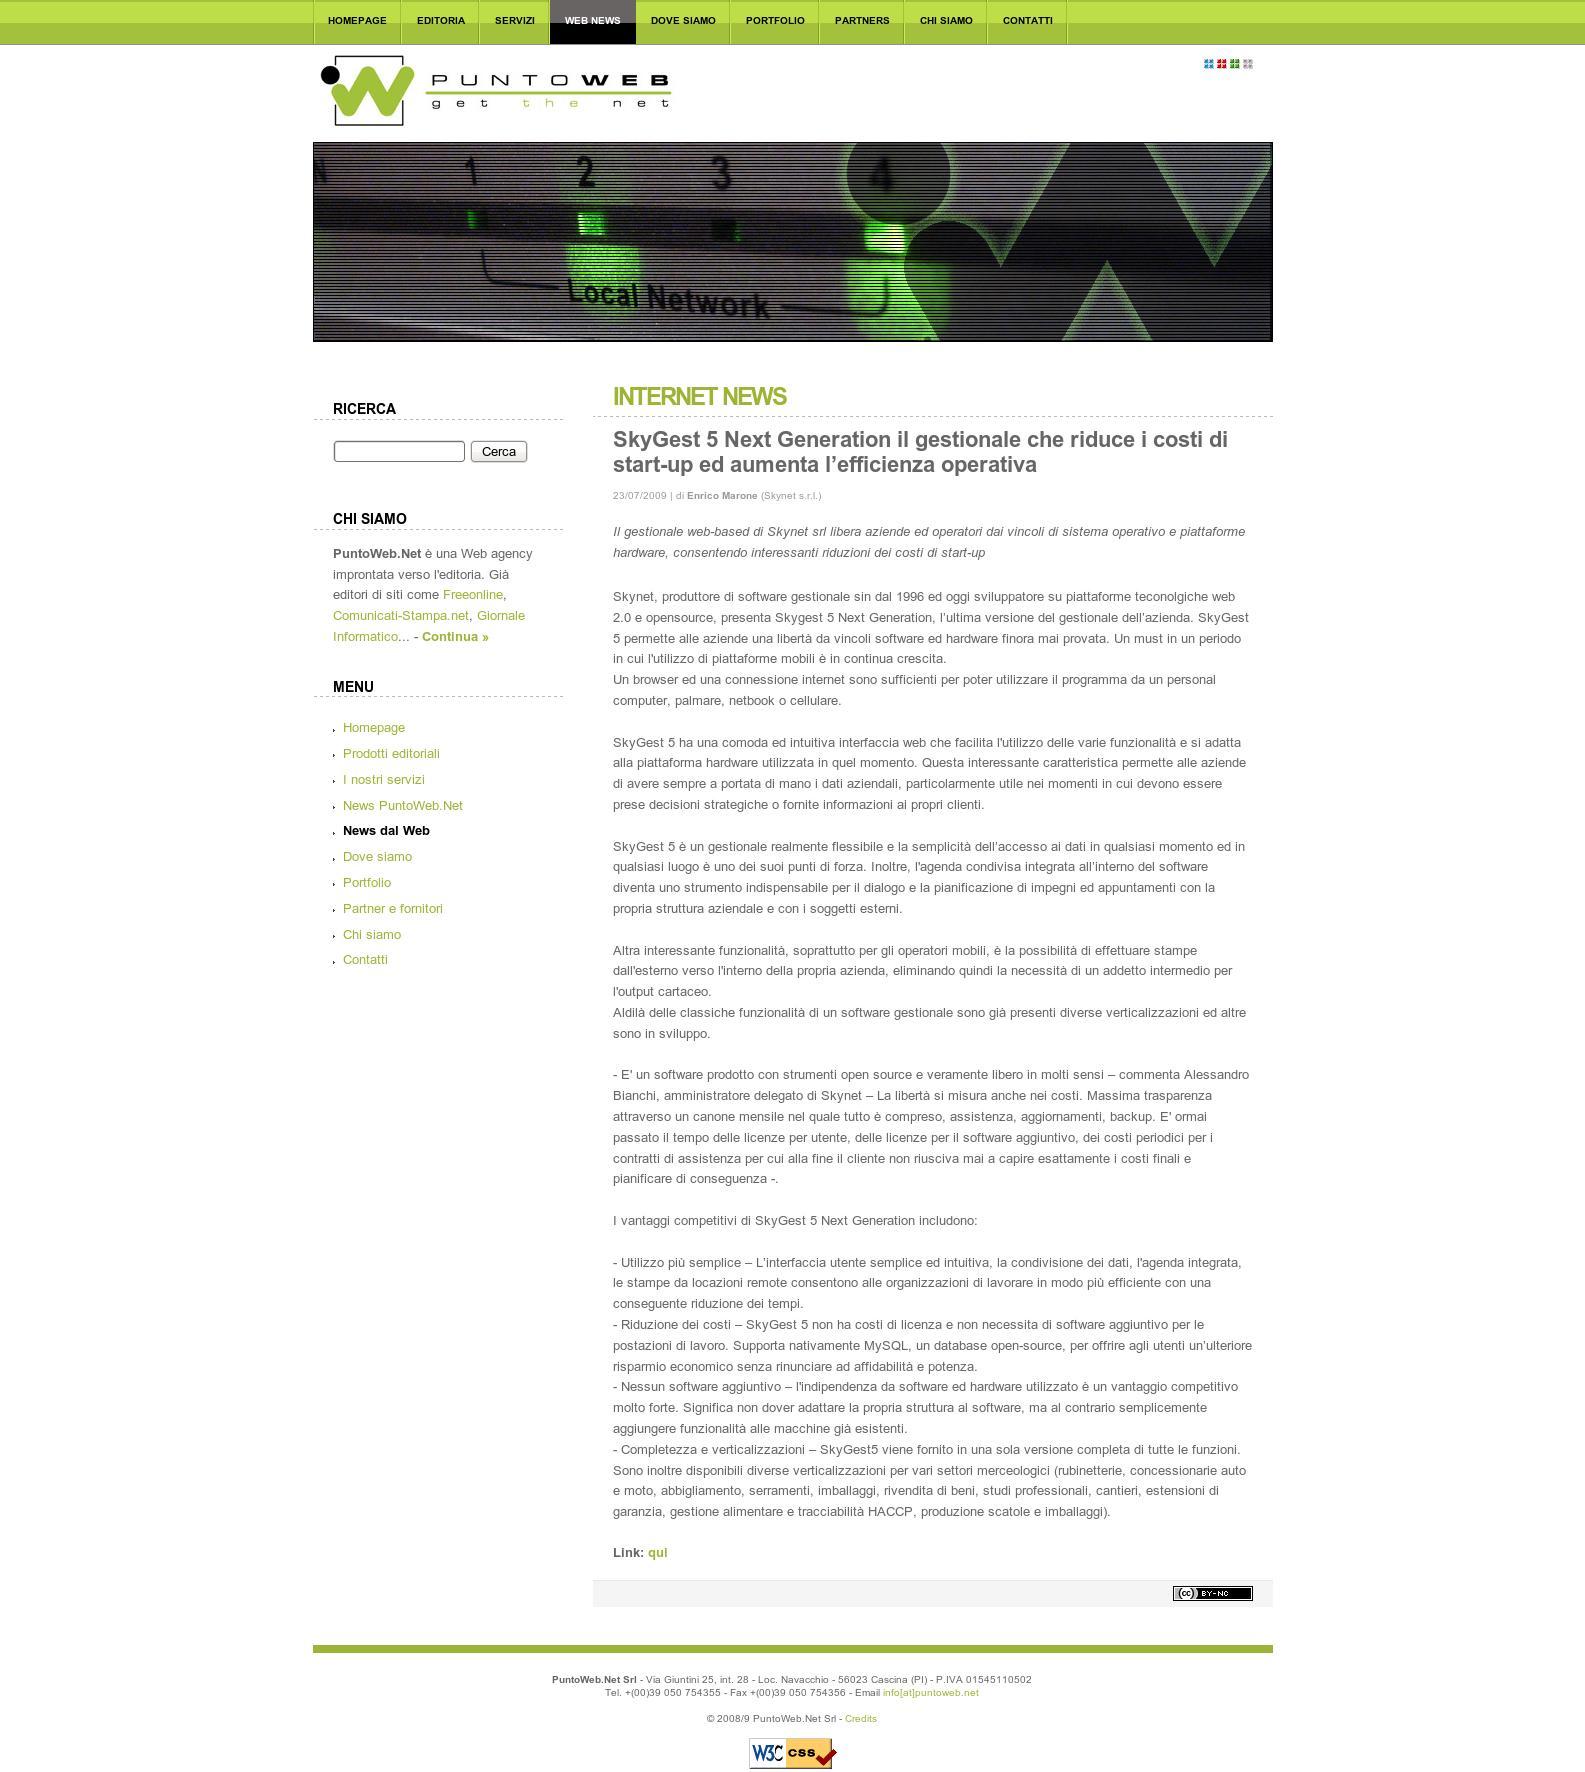 SkyGest 5 Next Generation il gestionale che riduce i costi di start-up ed aumenta l'efficienza operativa